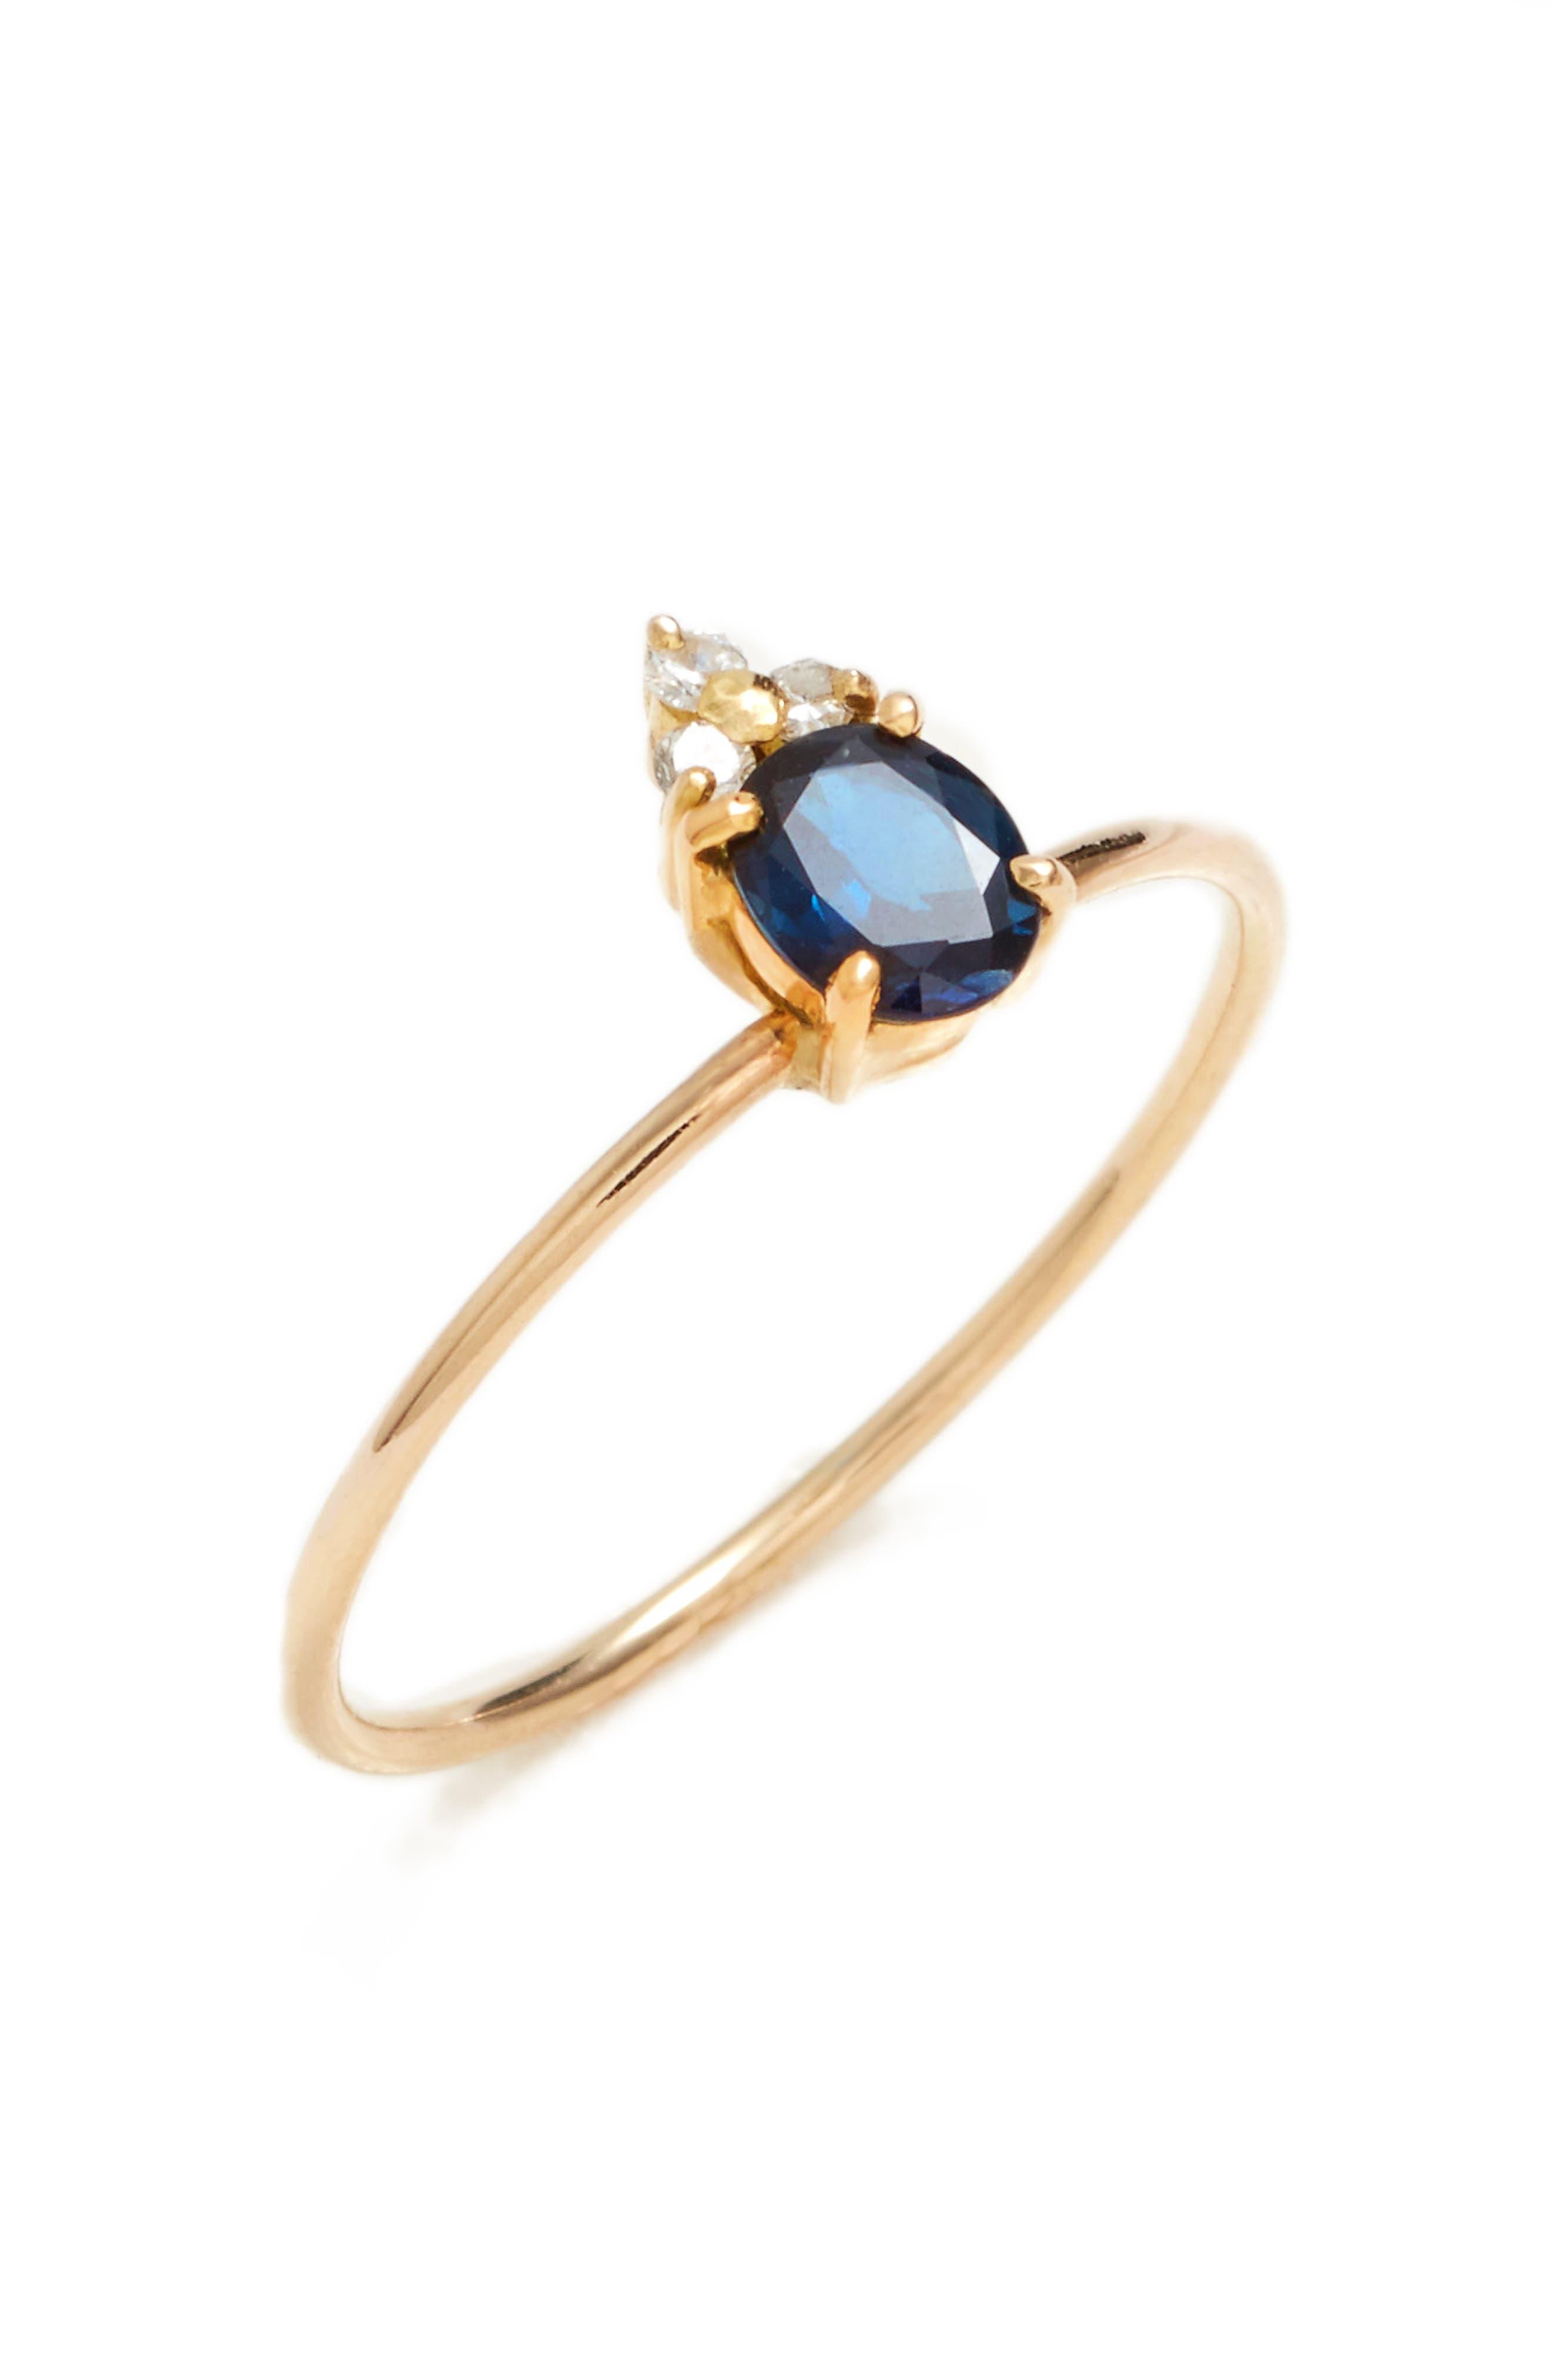 Skinny Stone Sapphire & Diamond Ring,                             Main thumbnail 1, color,                             Yellow Gold/ Blue Sapphire